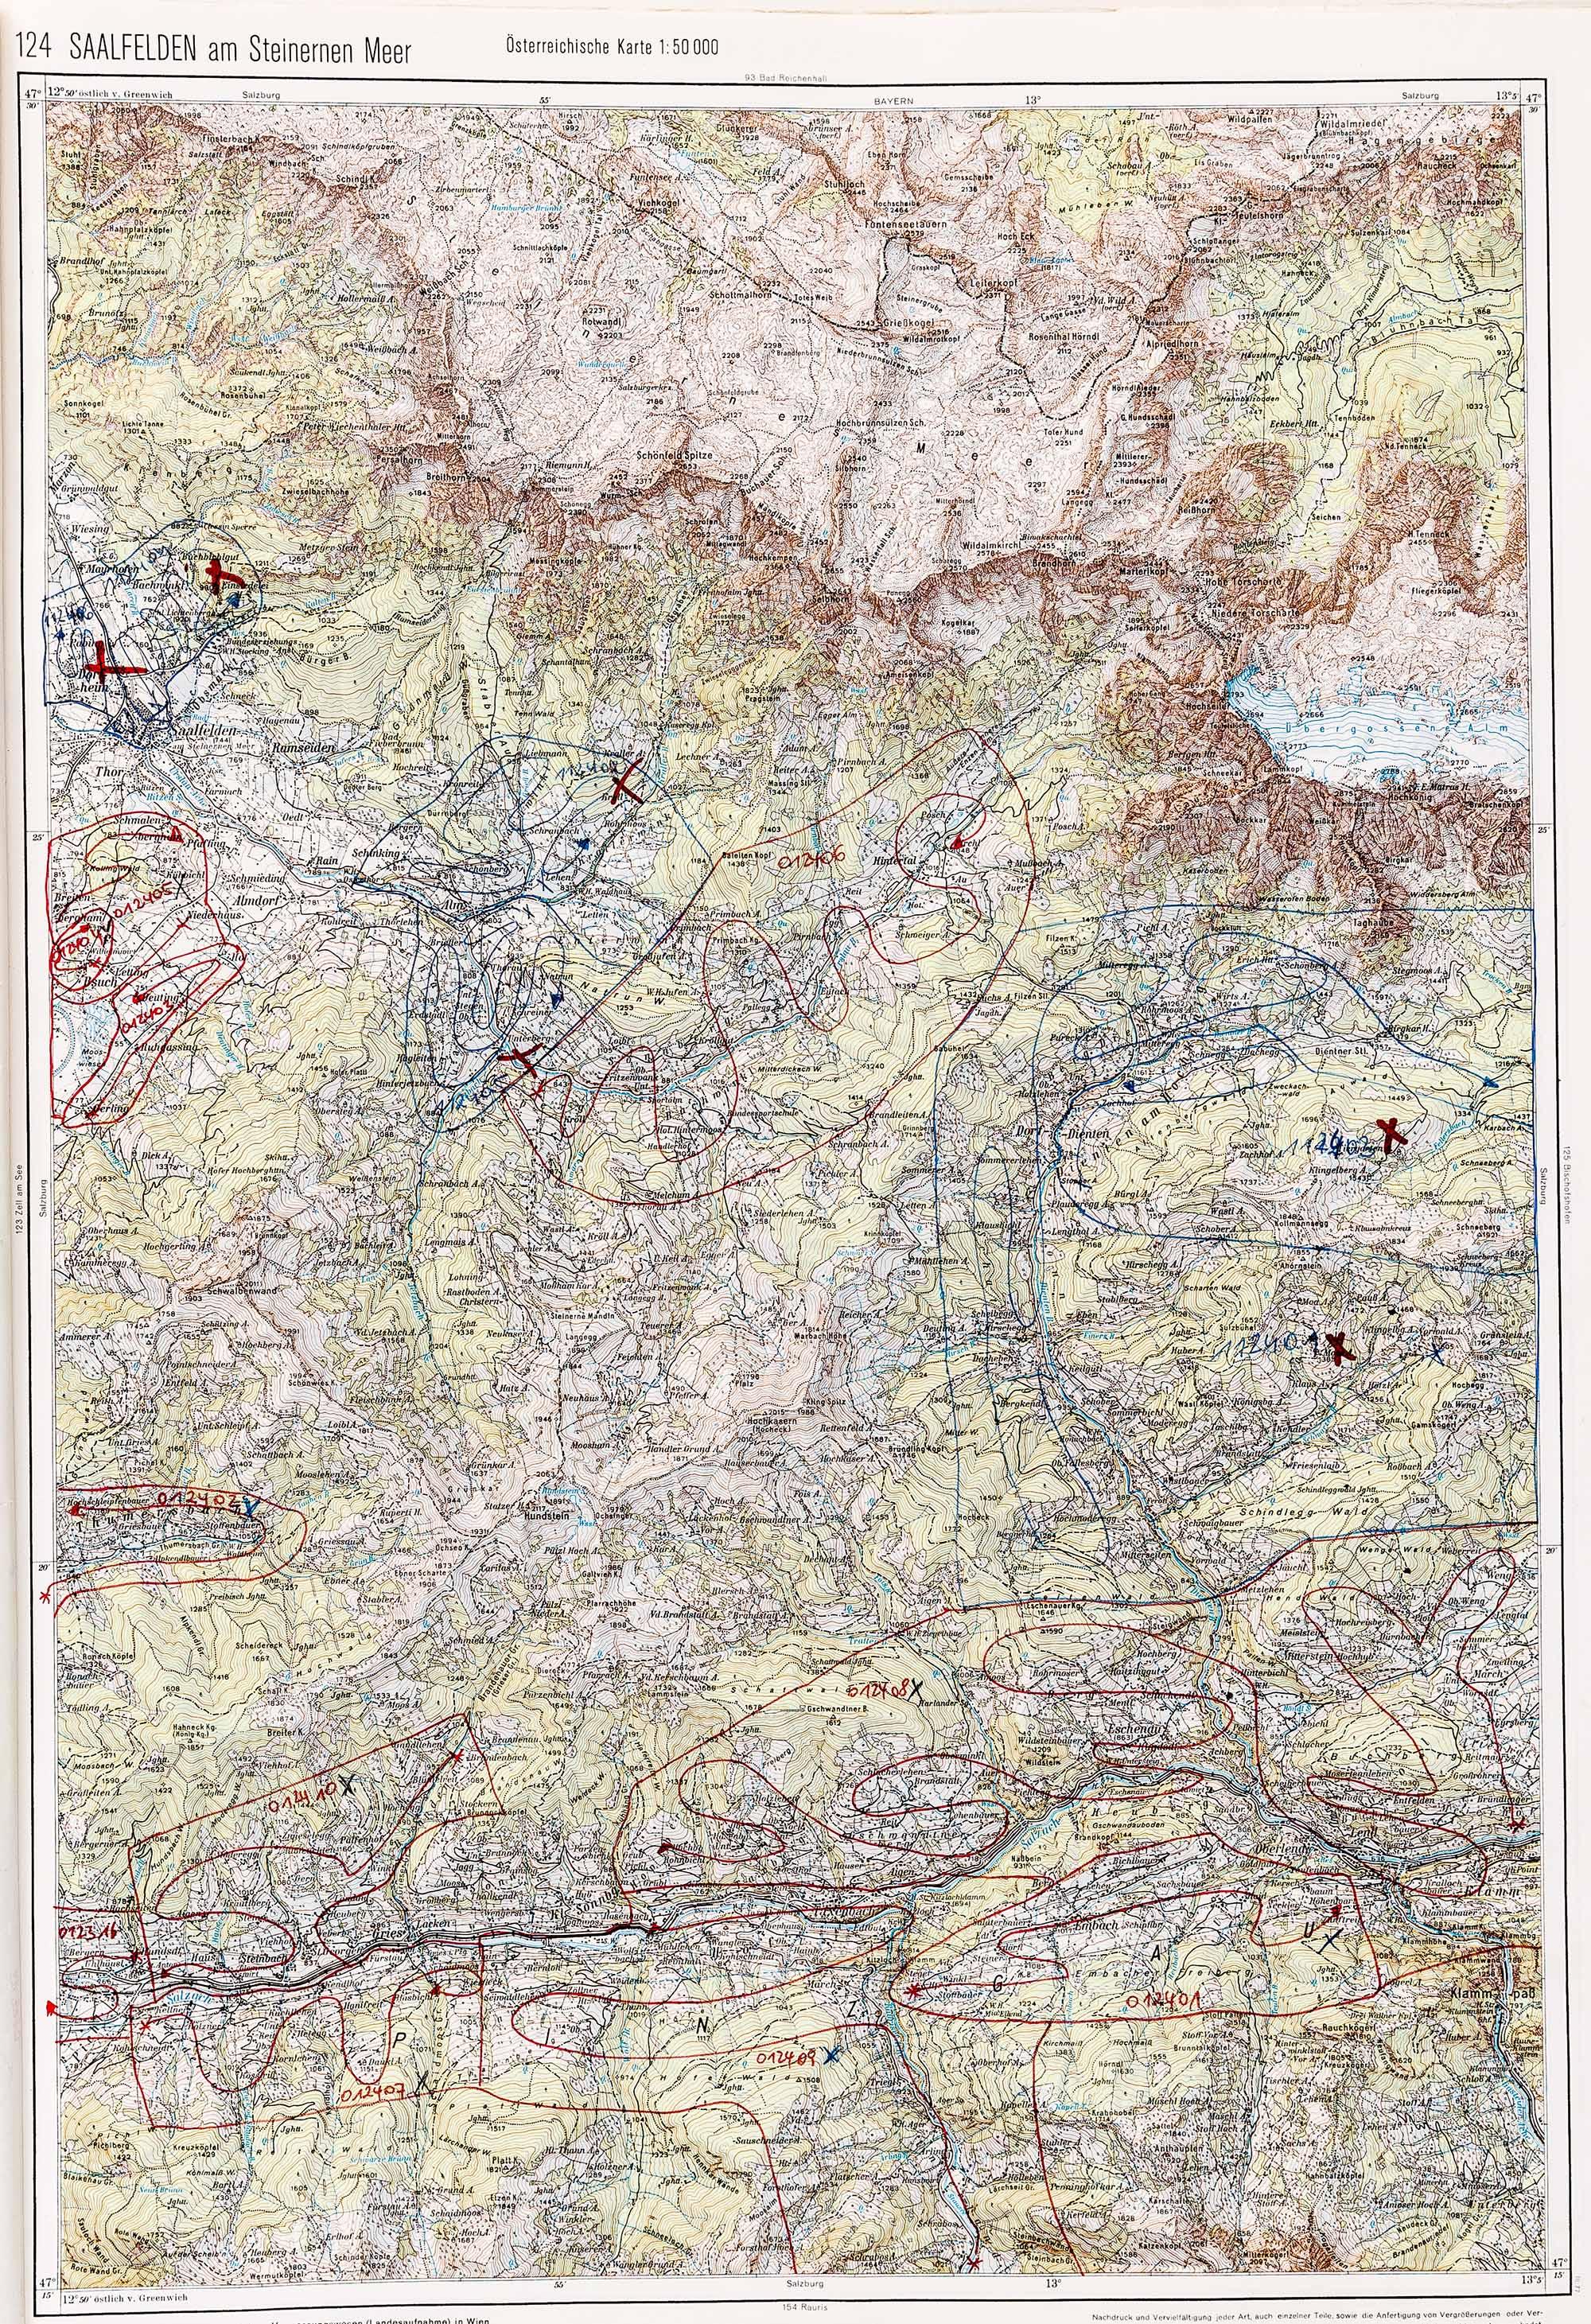 1979-1982 Karte 124